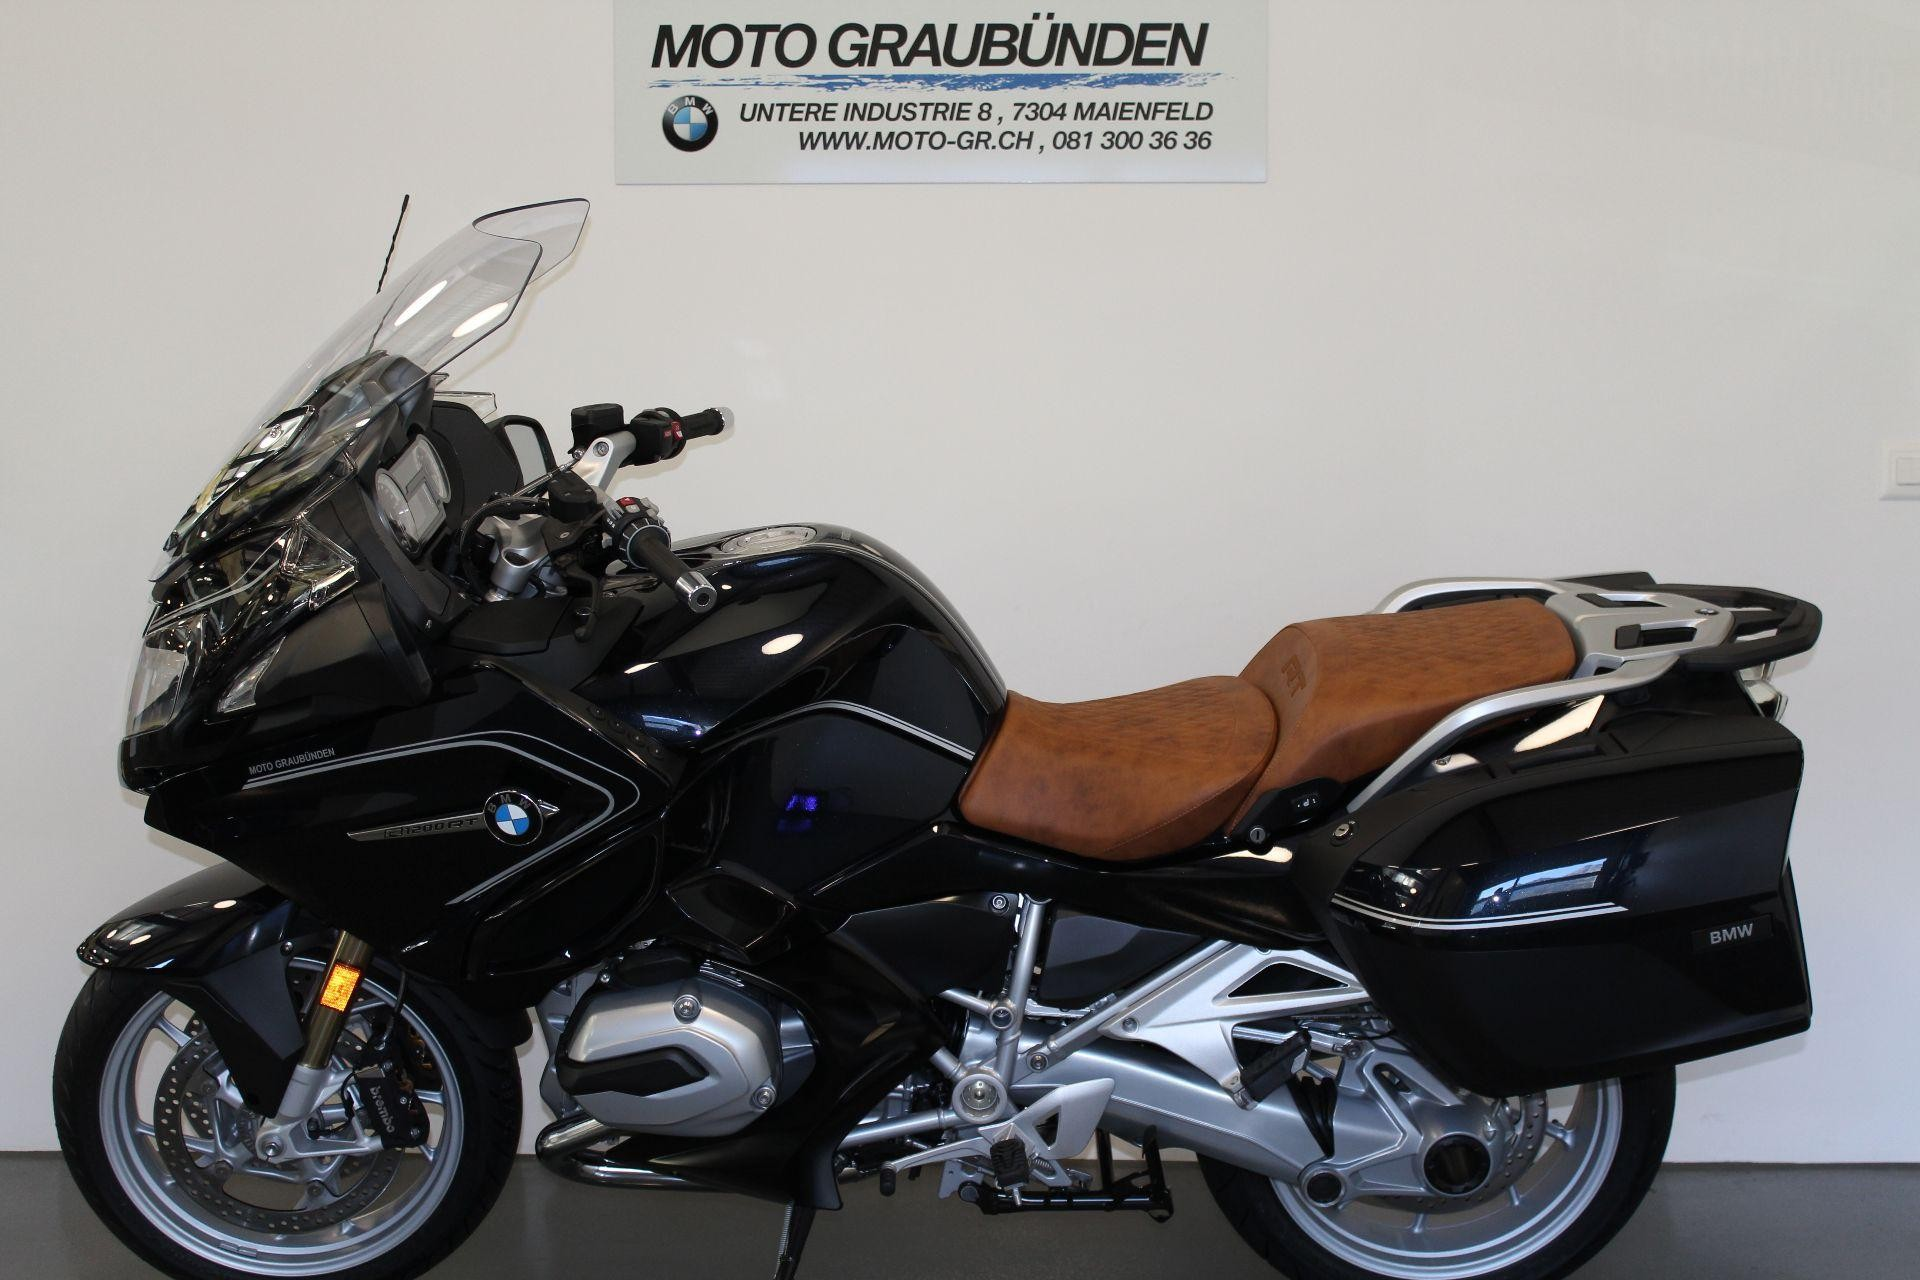 motorrad neufahrzeug kaufen bmw r 1200 rt abs moto. Black Bedroom Furniture Sets. Home Design Ideas